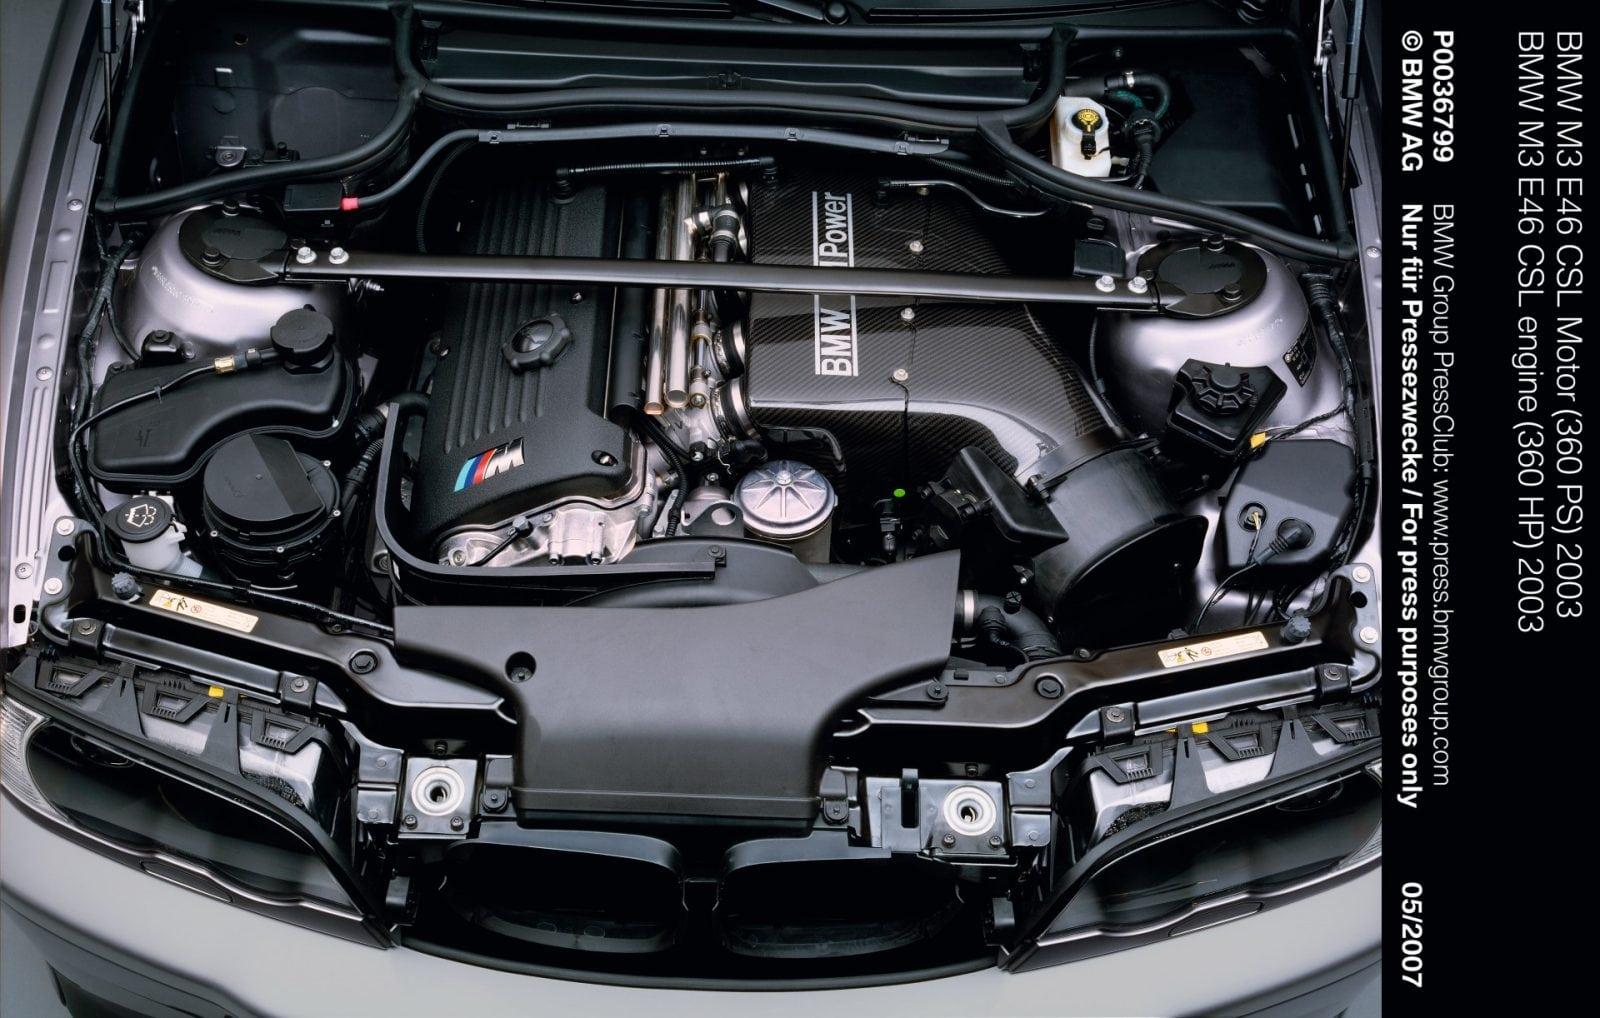 Двигатель BMW M3 E46 CSL 2003 года. (S54) выдавал 360 л.с.